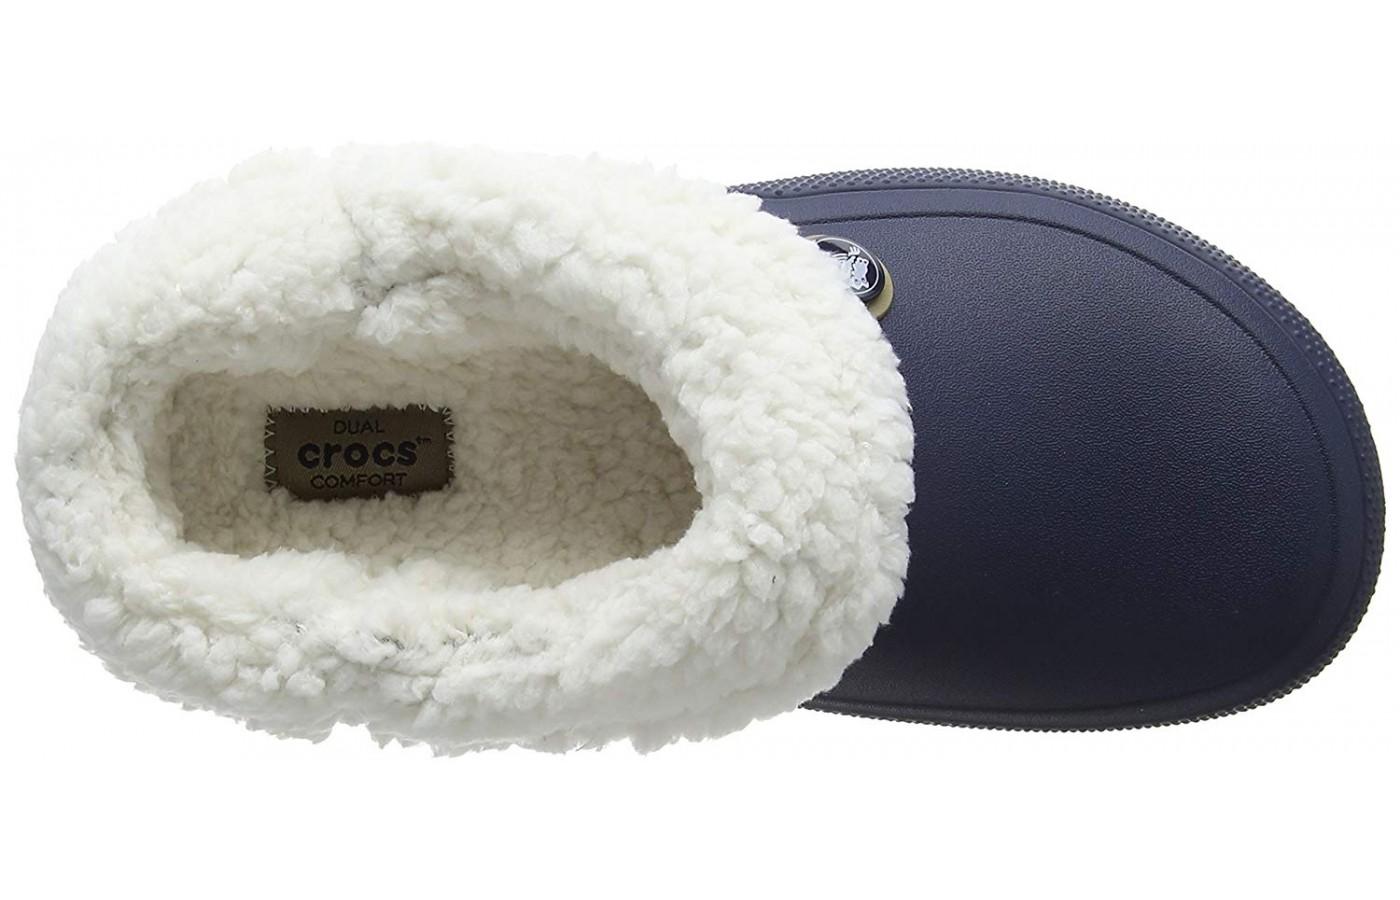 Crocs Classic Blitzen III Top